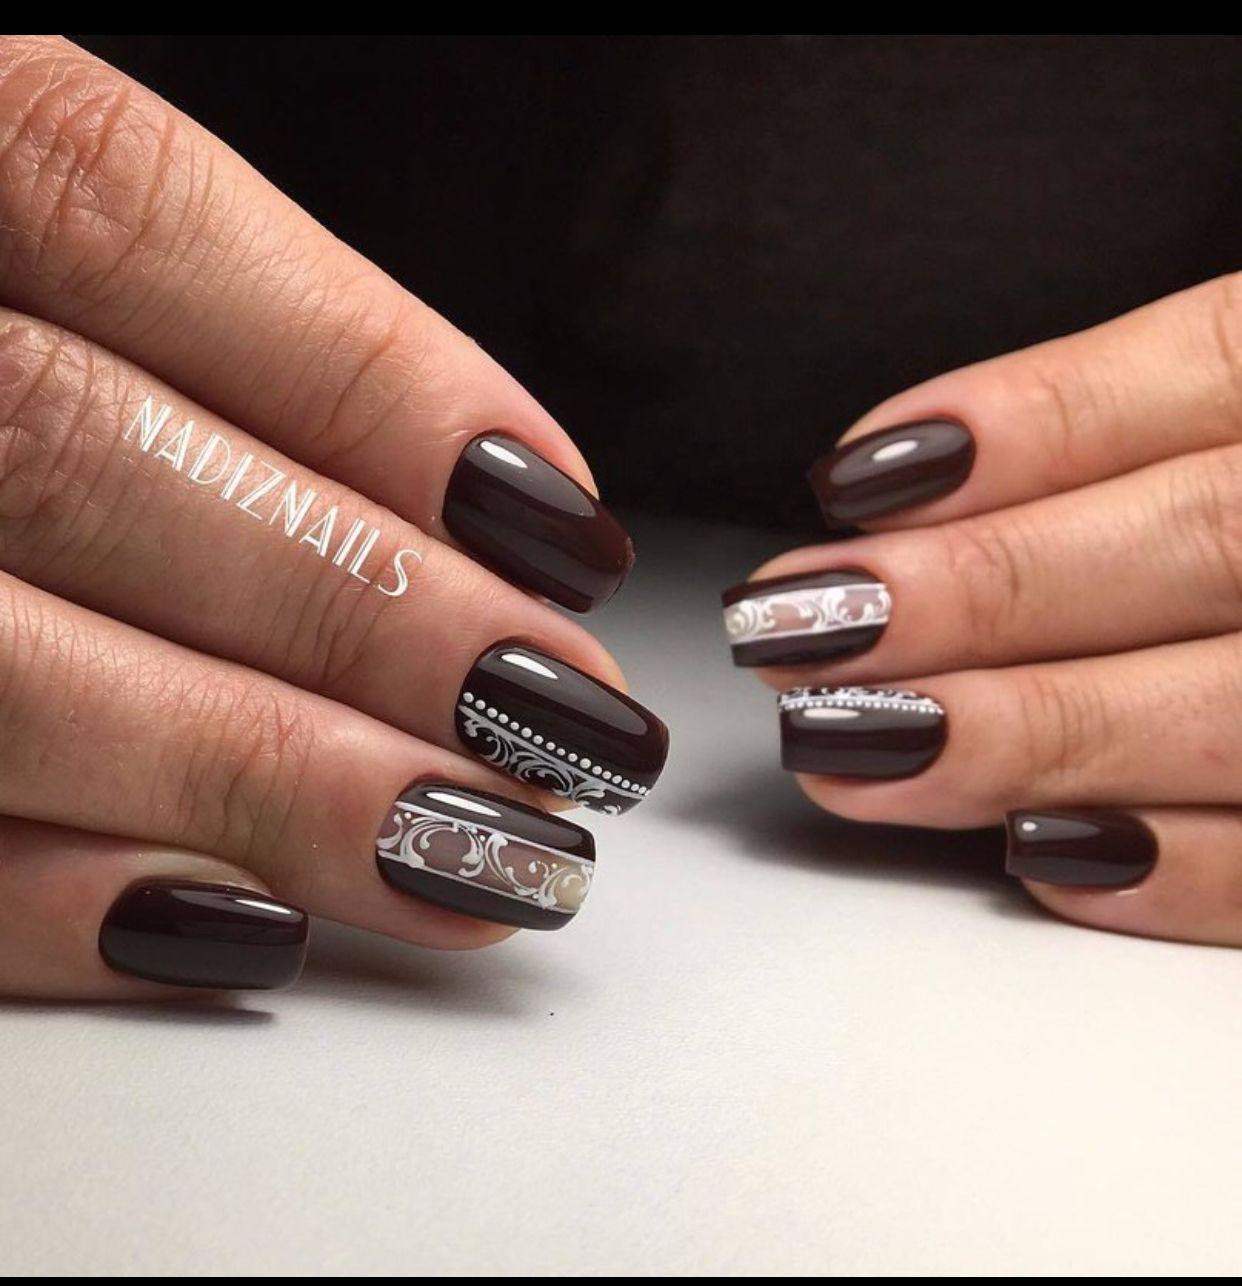 Autumn Nails Design Nail Art Designs 3d Diamond Decorations Stamping Pretty Beauty